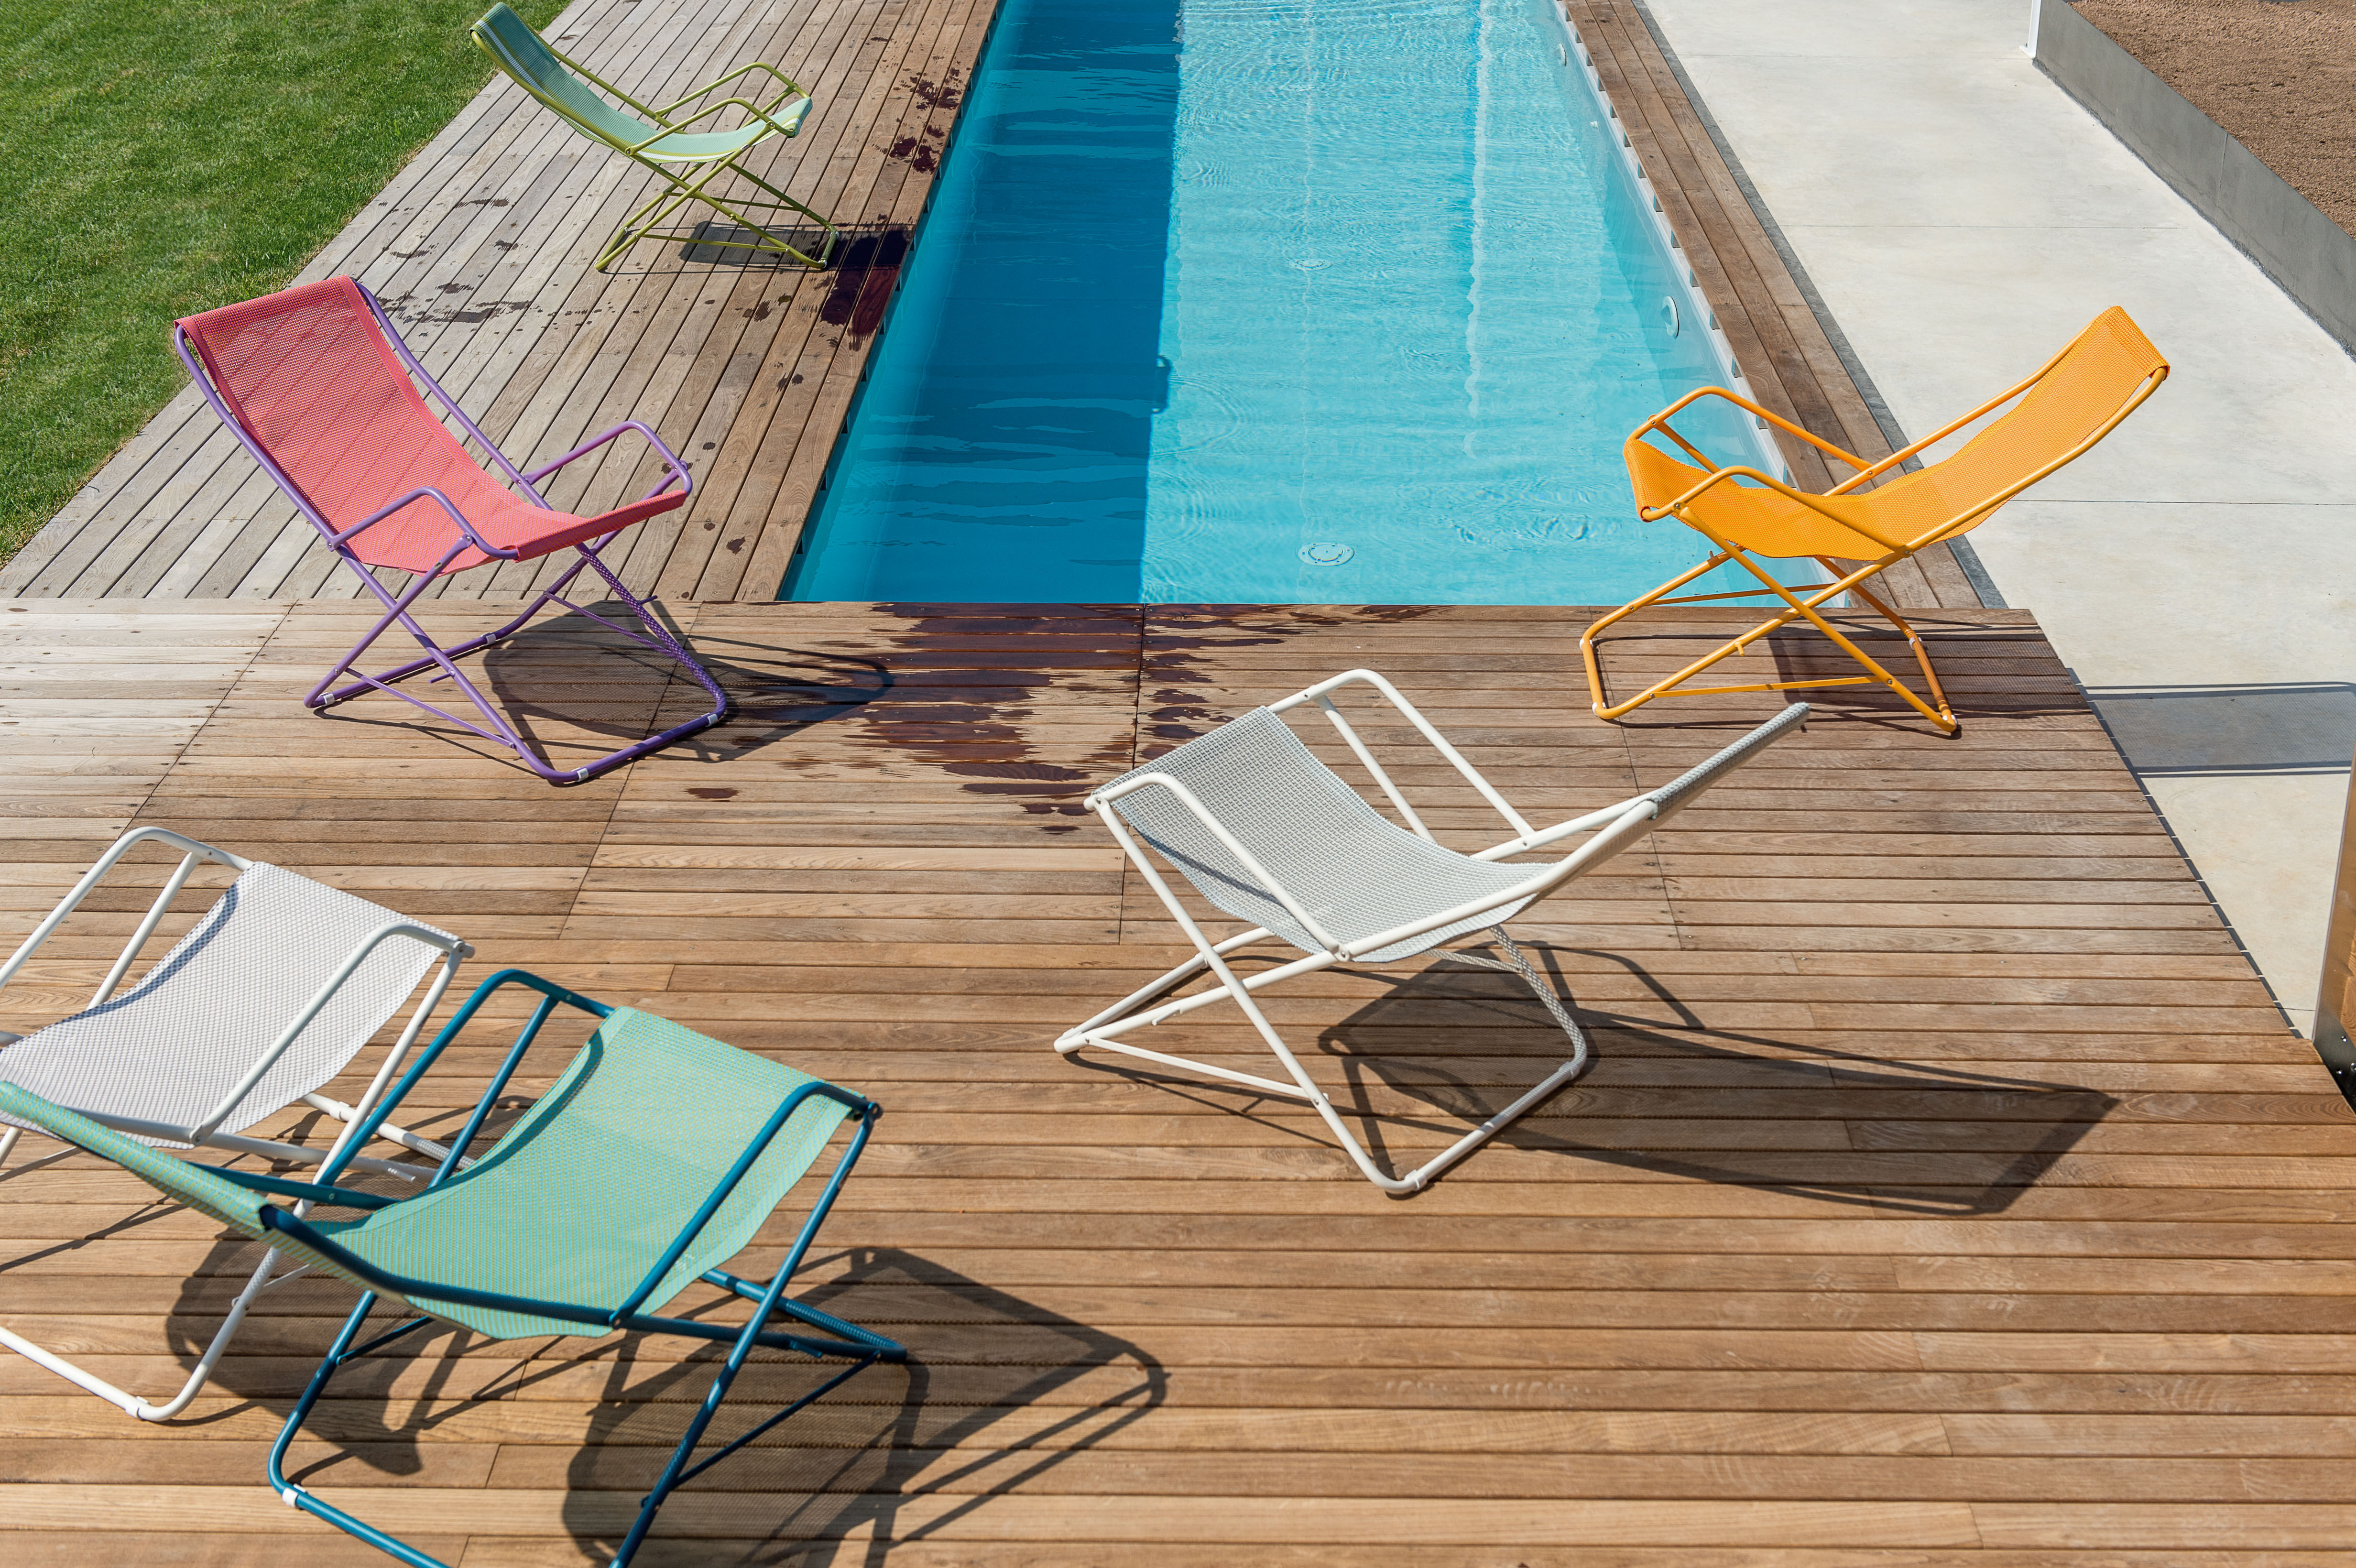 chaise longue bahama pliable toile rose structure. Black Bedroom Furniture Sets. Home Design Ideas